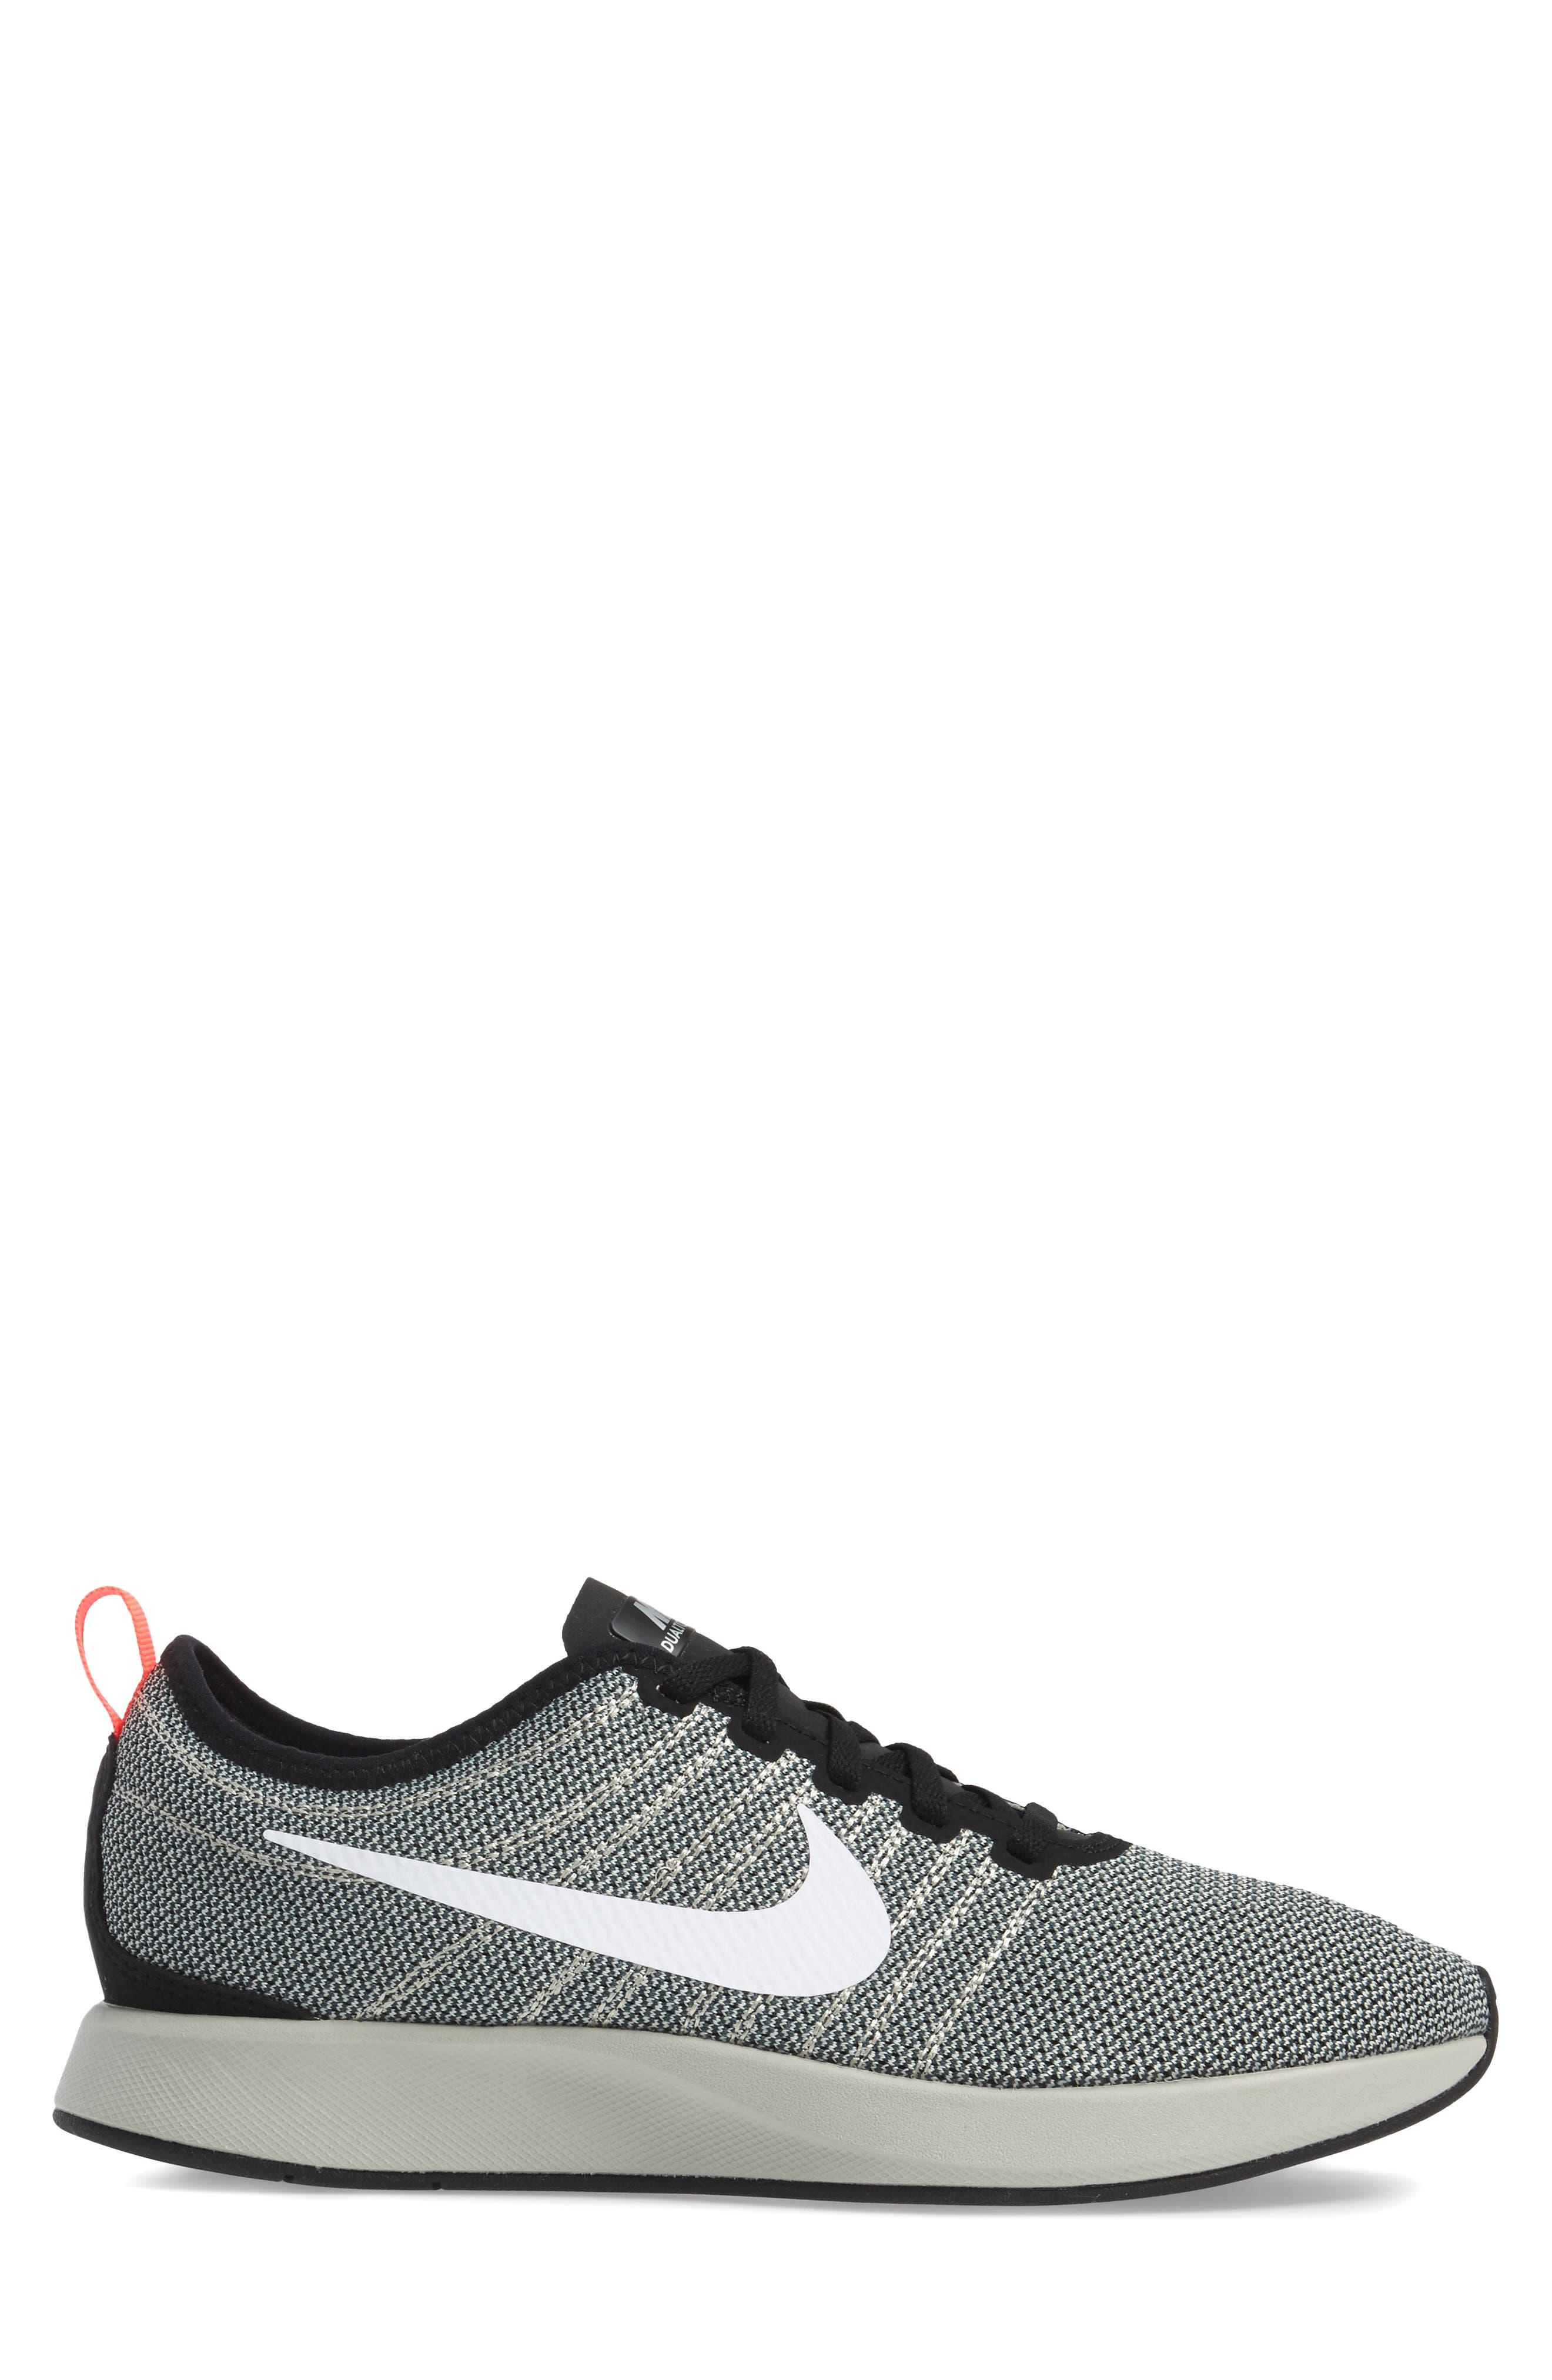 Alternate Image 3  - Nike Dualtone Racer Running Shoe (Men)